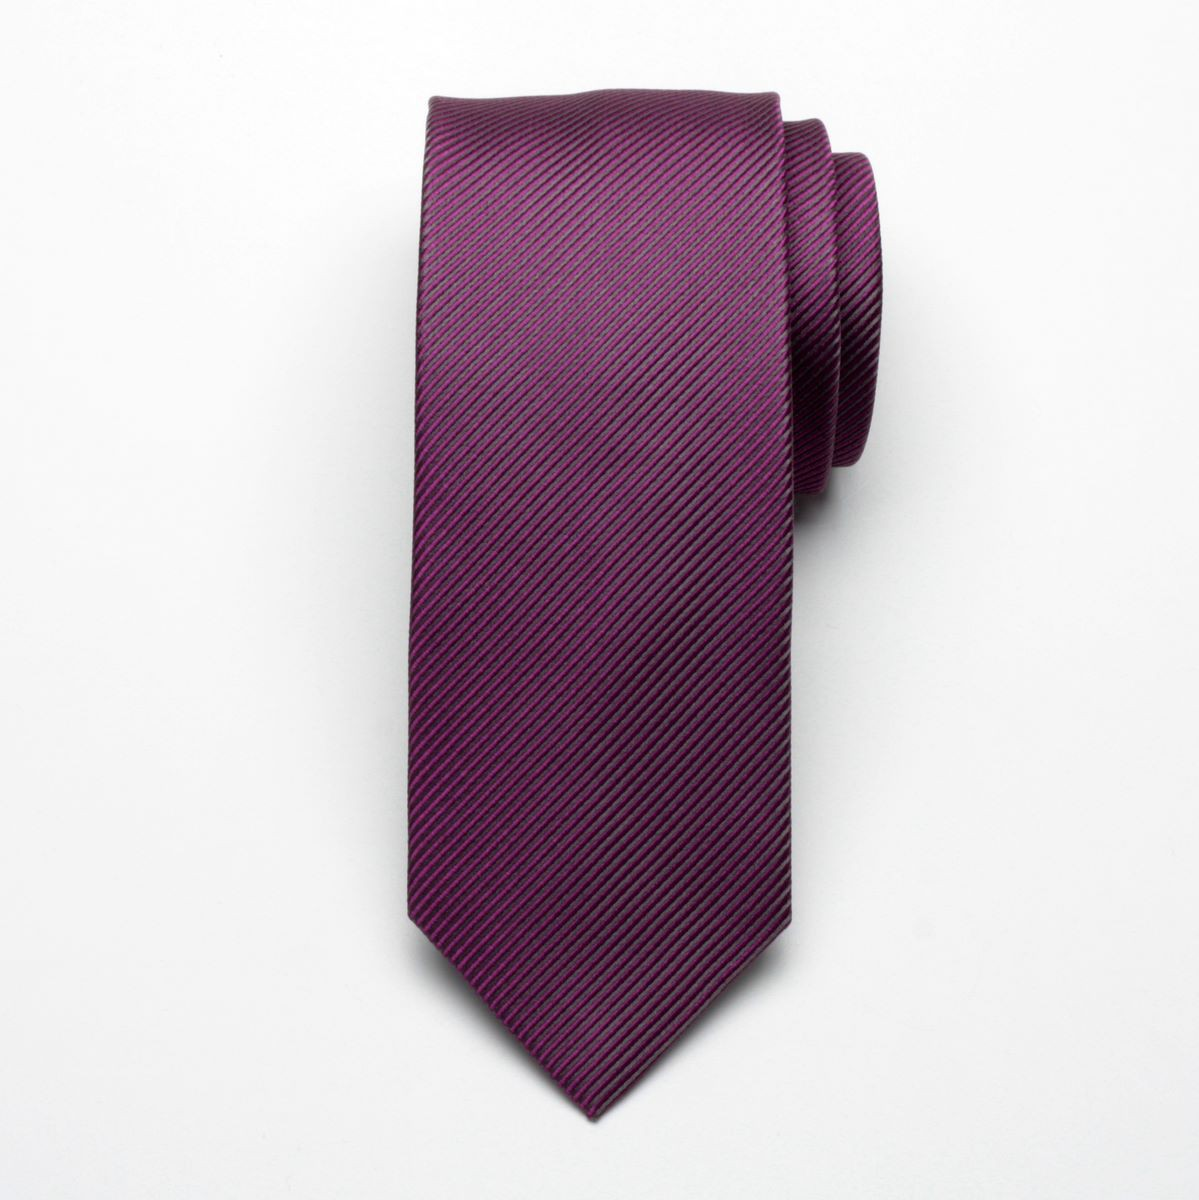 Krawat jedwabny Fine Selection (wzór 67)